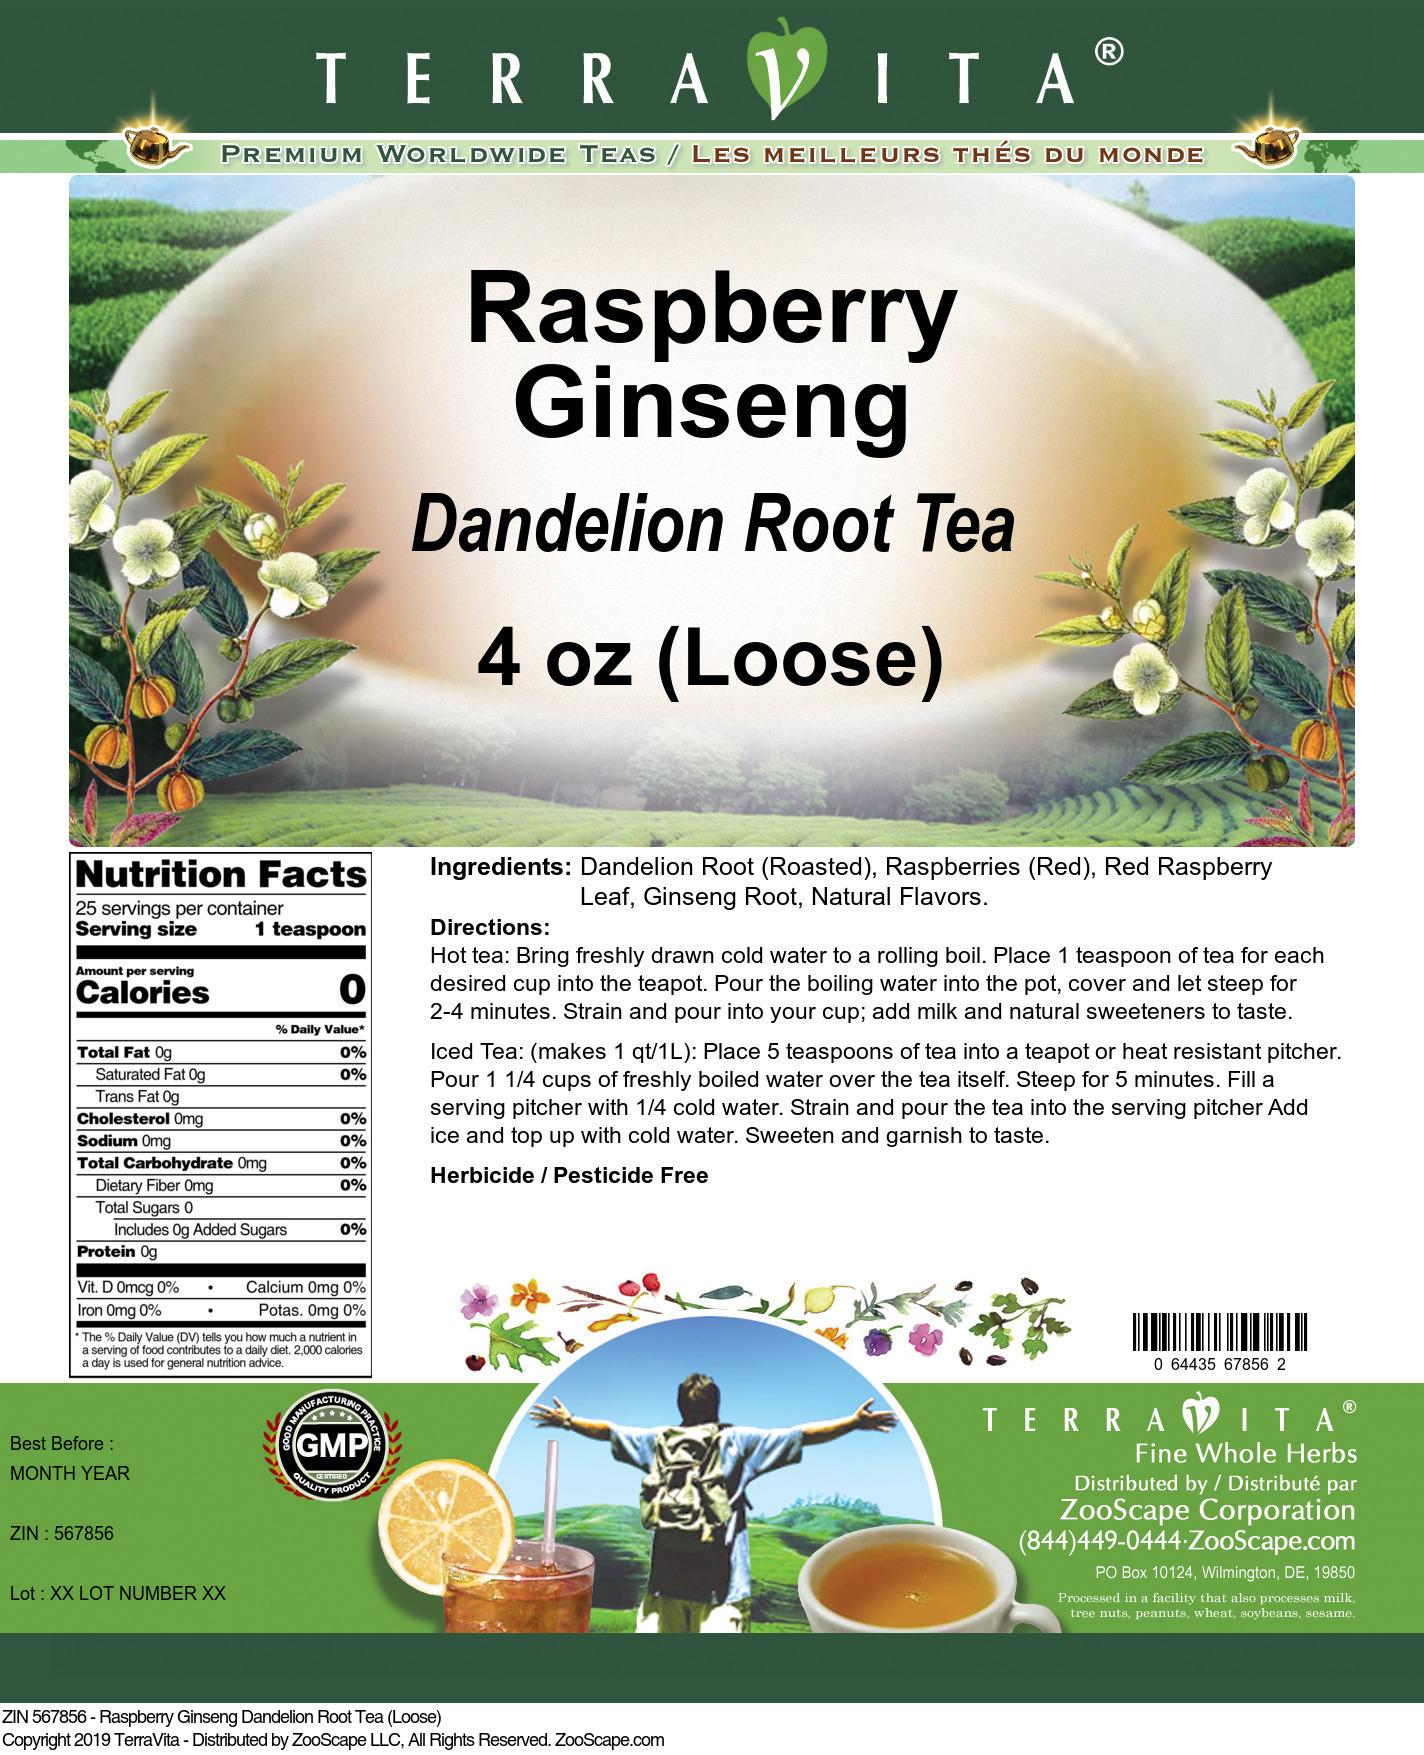 Raspberry Ginseng Dandelion Root Tea (Loose)